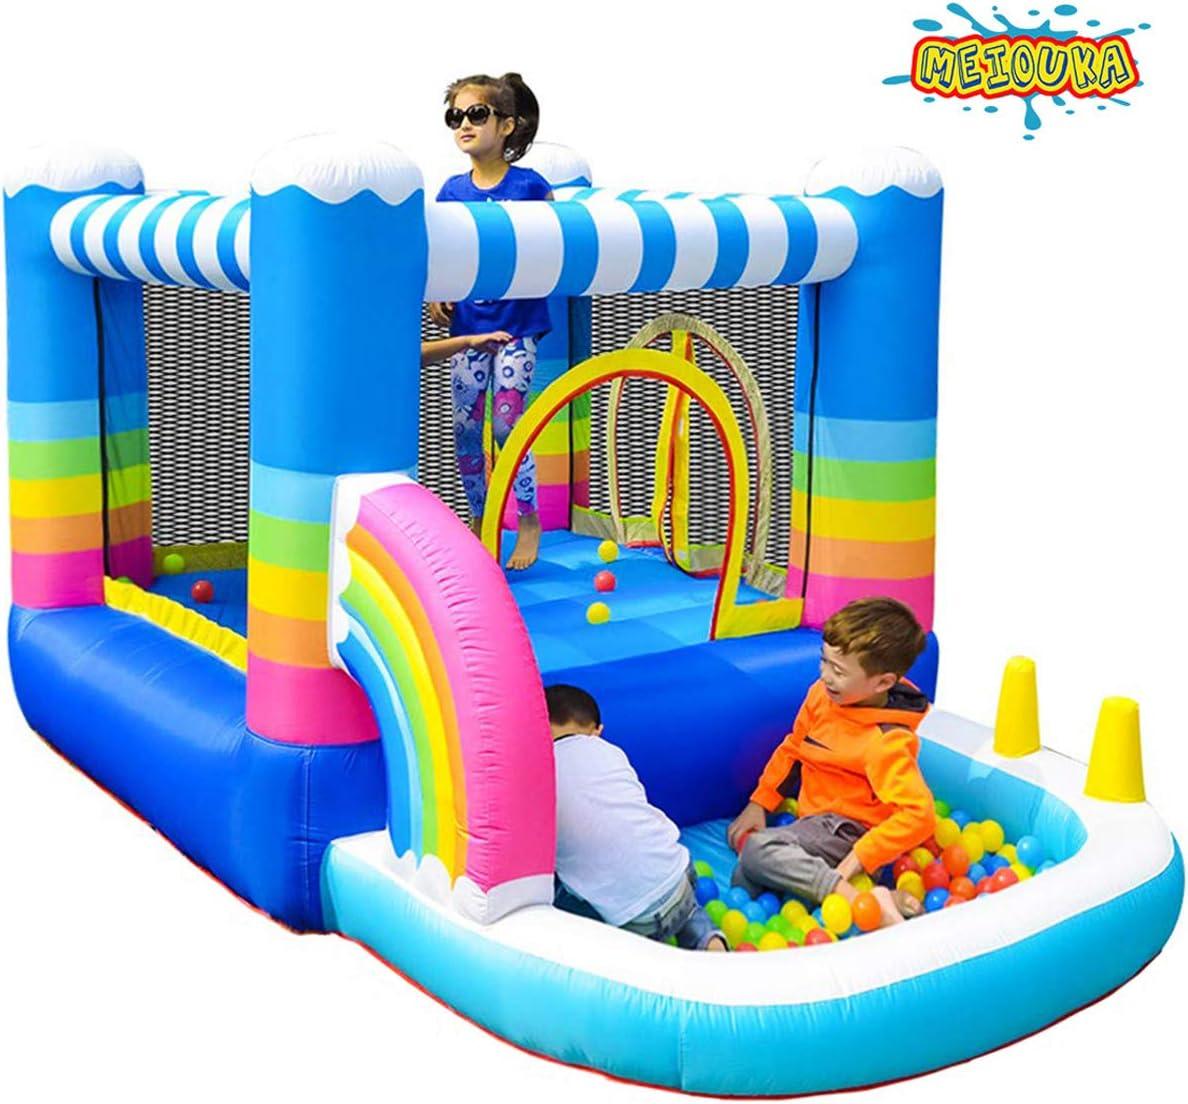 Amazon.com: MEIOUKA - Jumper inflable para niños con 350 W ...